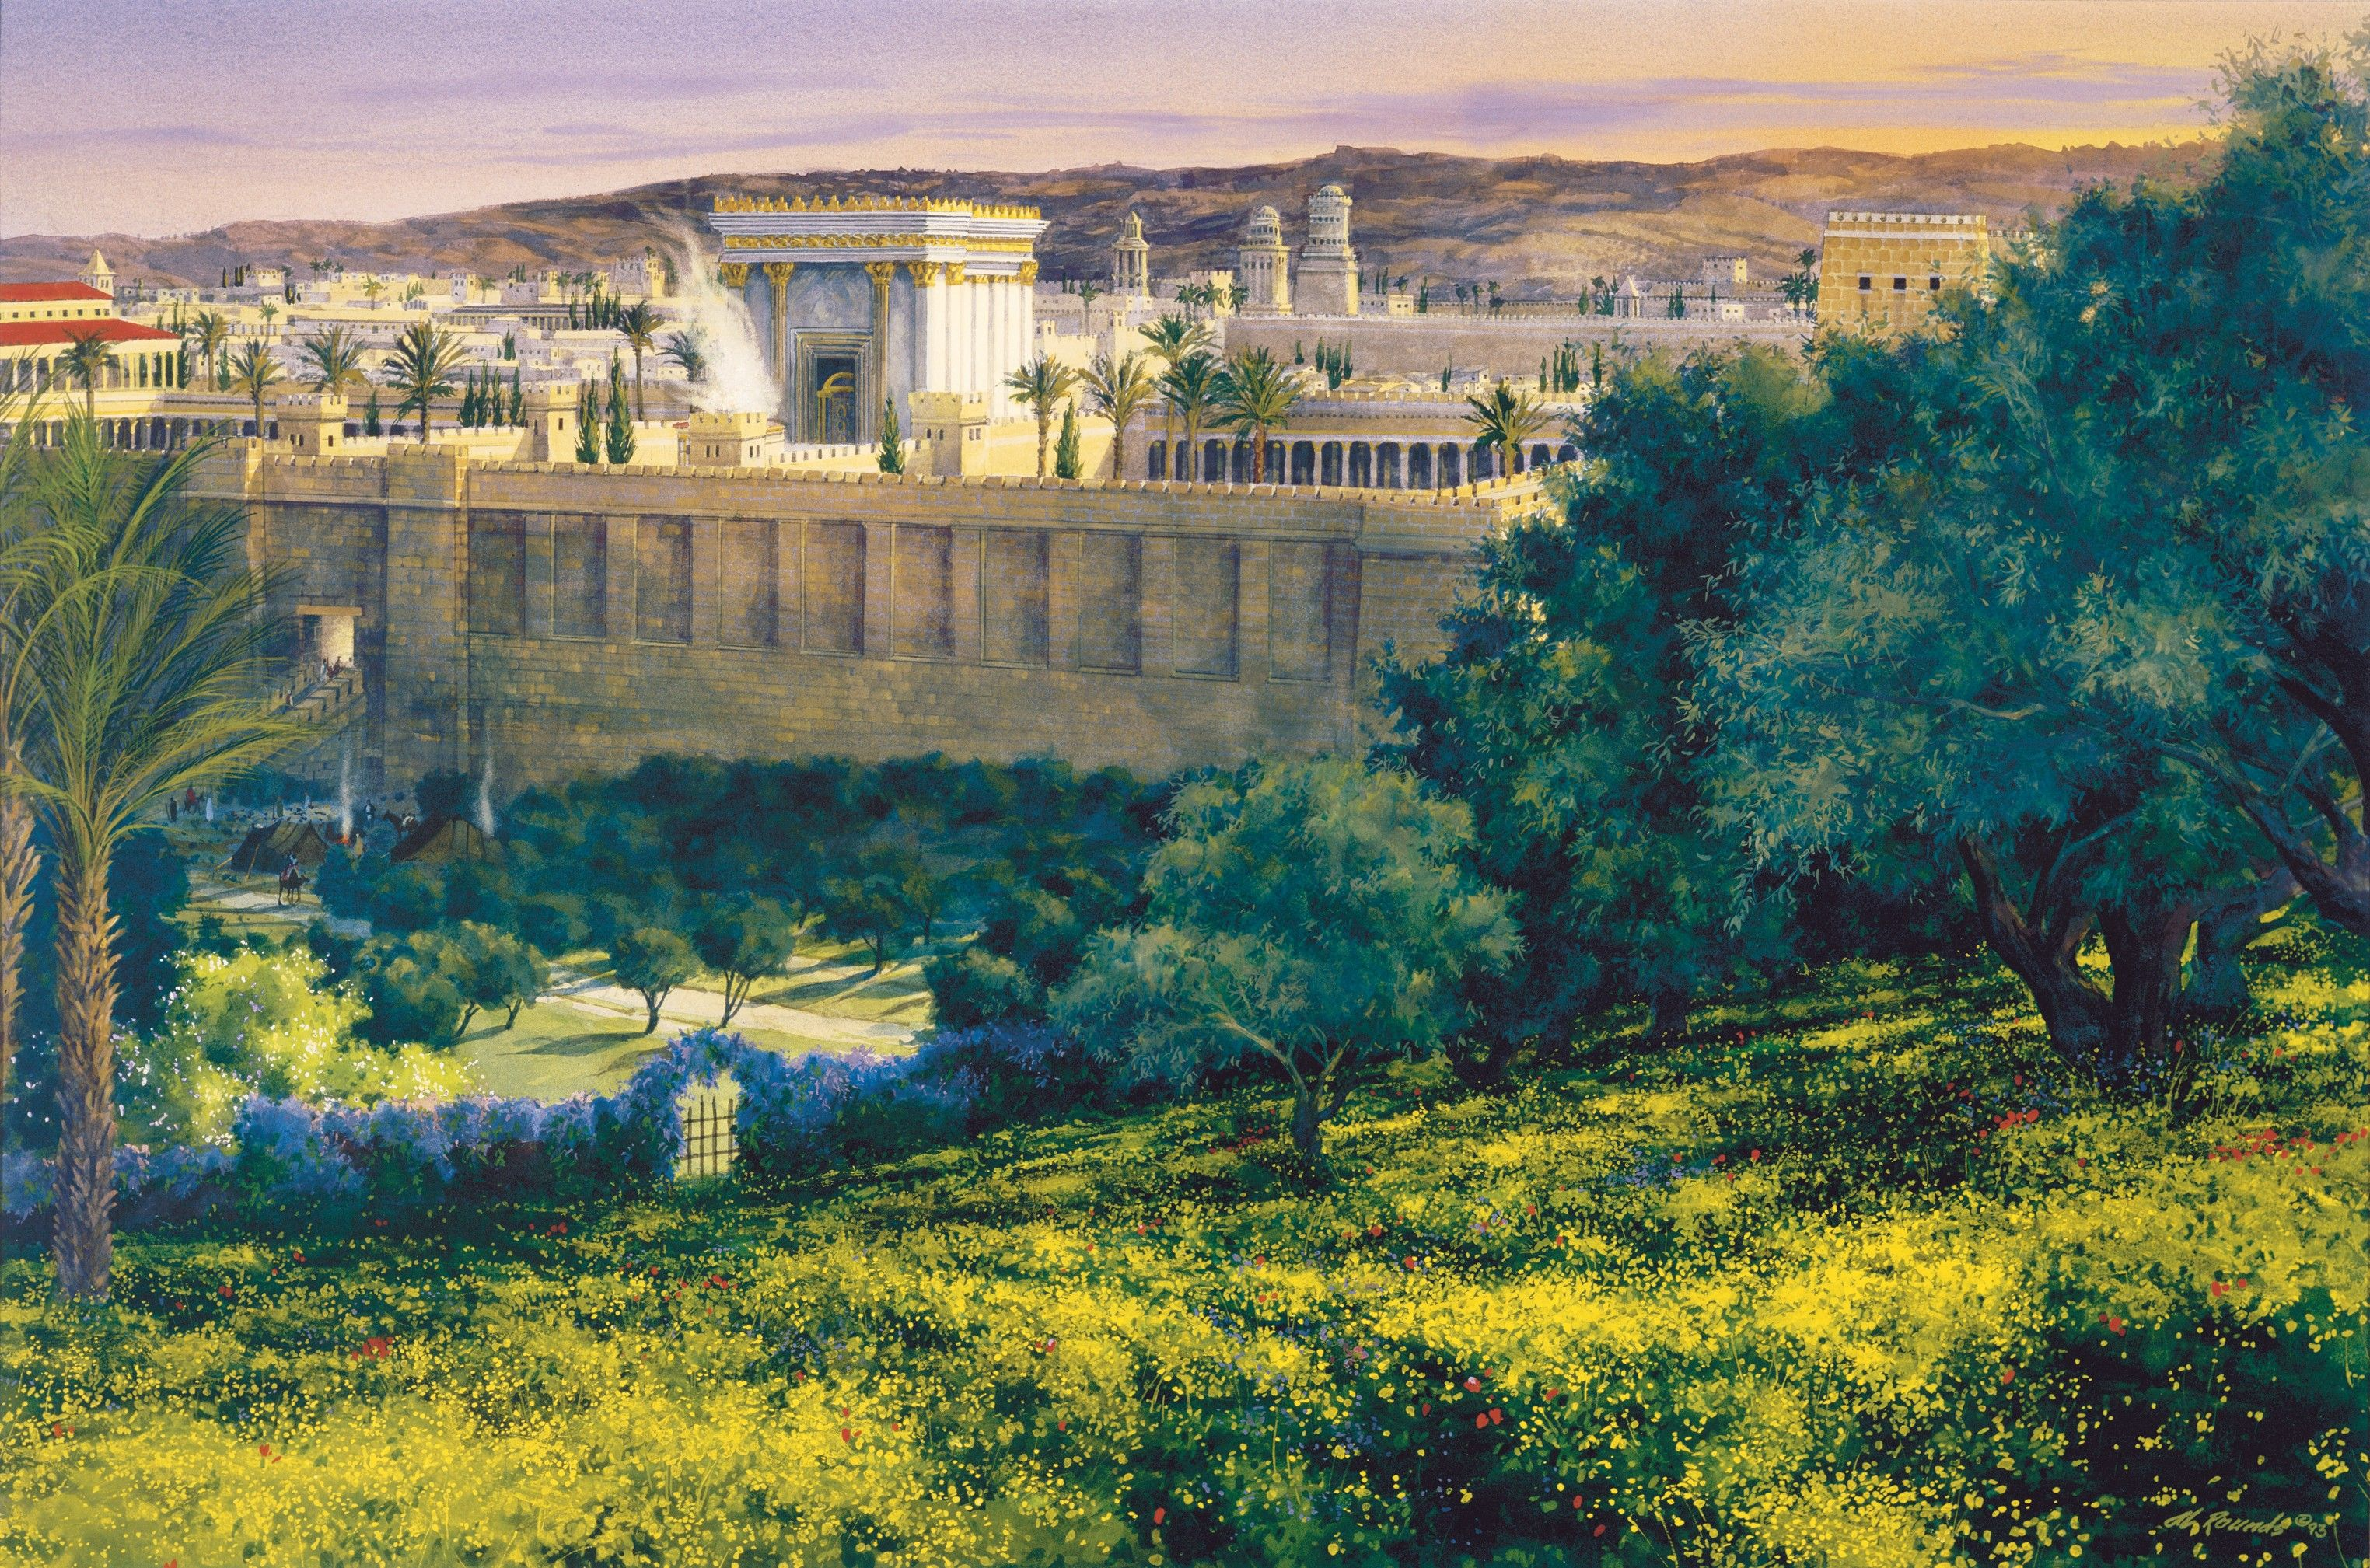 My Father's House, by Al Rounds; GAB 52; Matthew 21:14–15; Luke 21:37–38; John 2:16; 8:2